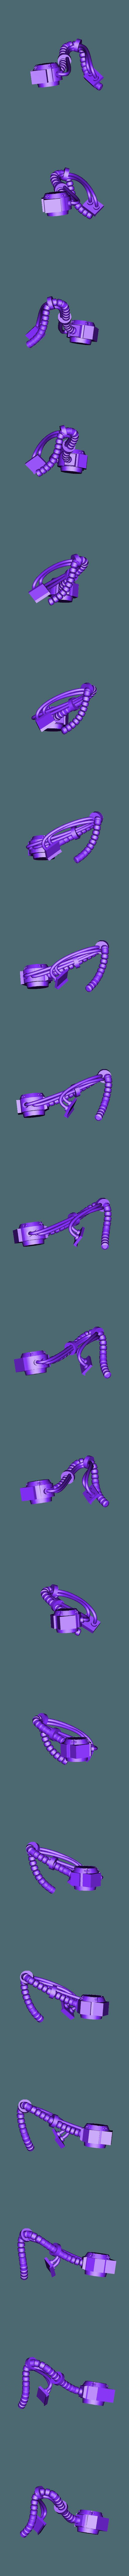 Aggressor_5_Left_Hoses.stl Download free STL file Flame Armed Instigators • 3D printable template, danny_cyanide